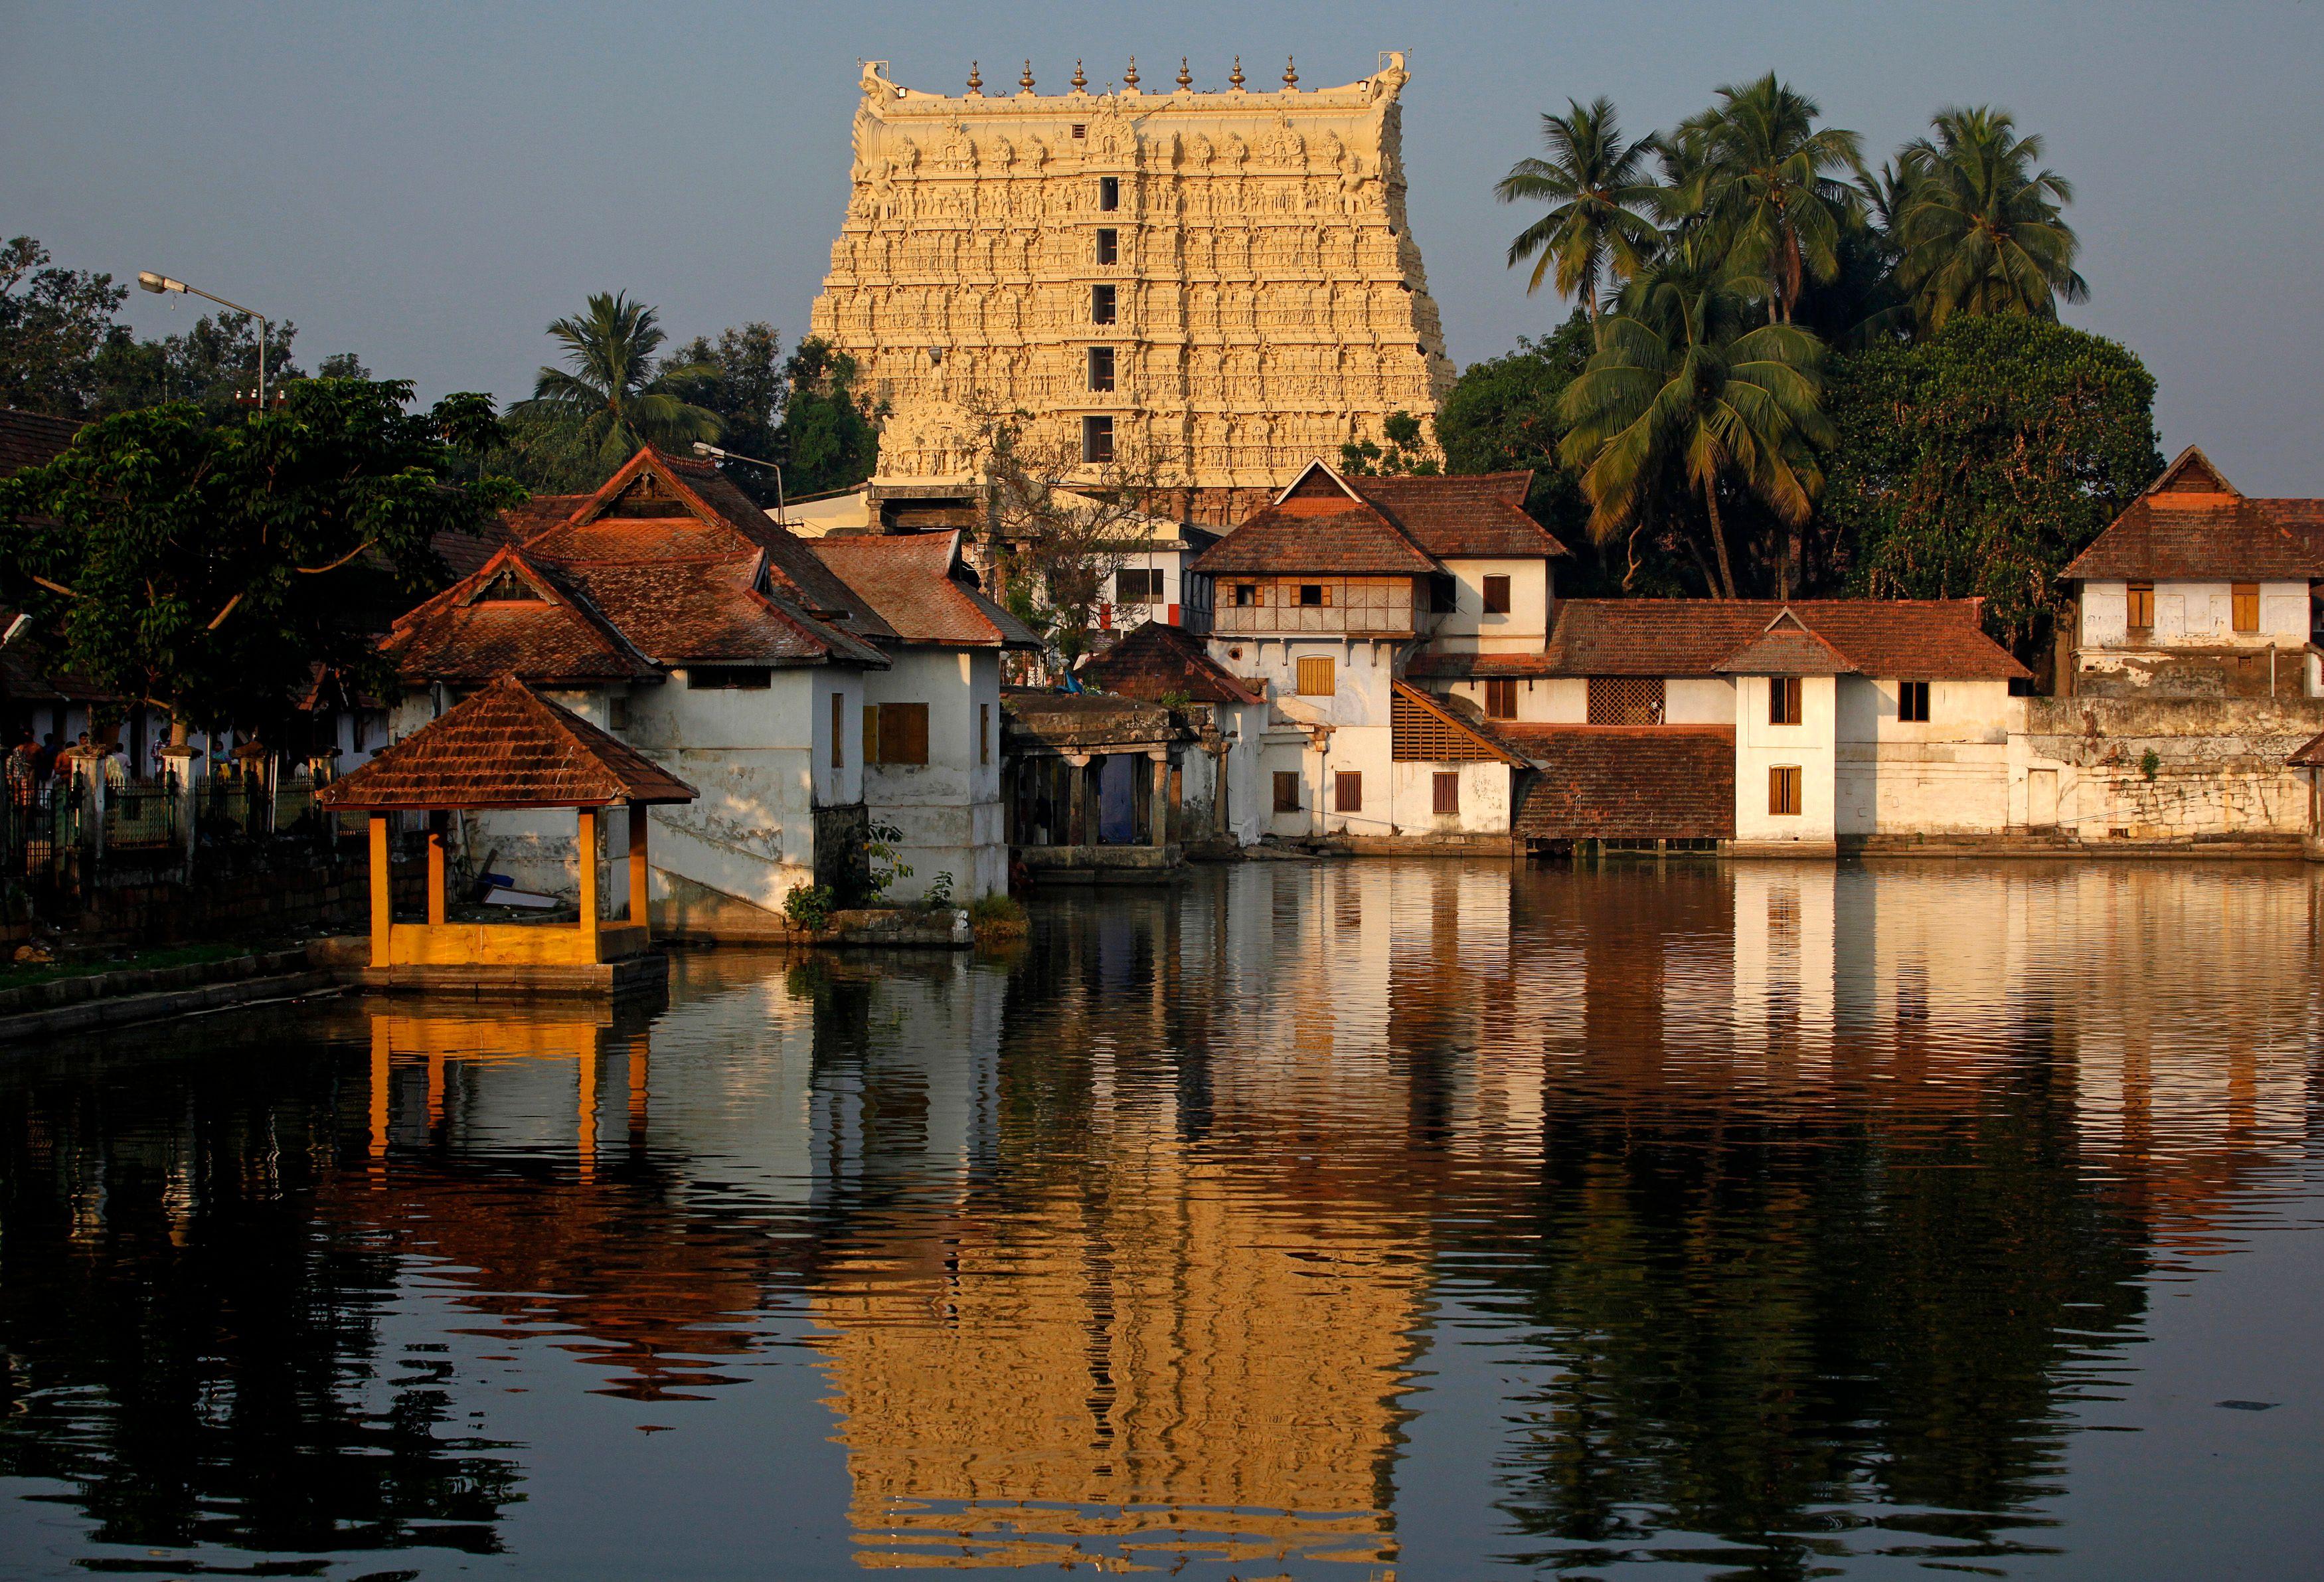 Le temple Sree Padmanabhaswamy